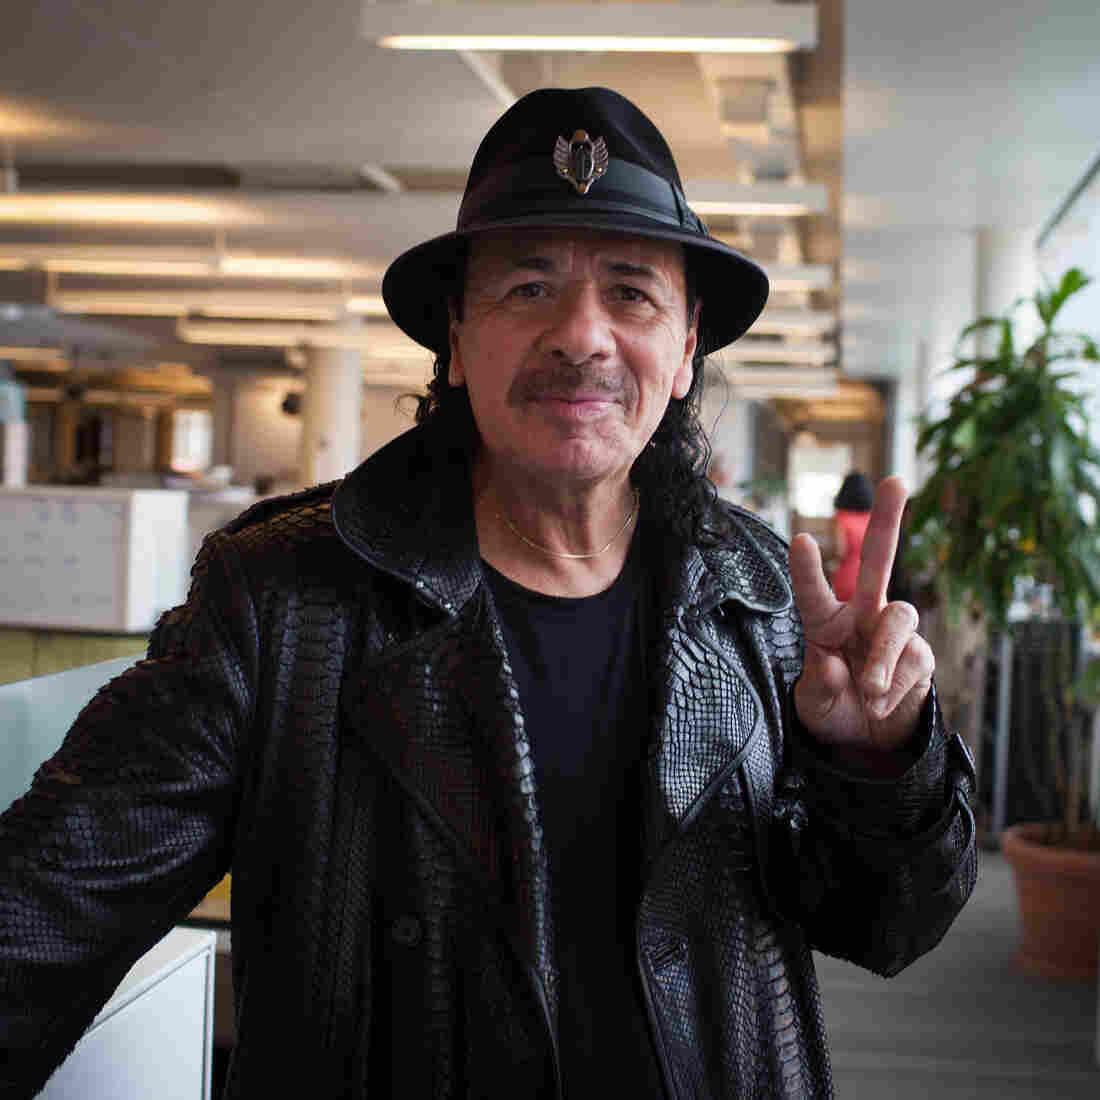 Carlos Santana: 'I Am A Reflection Of Your Light'